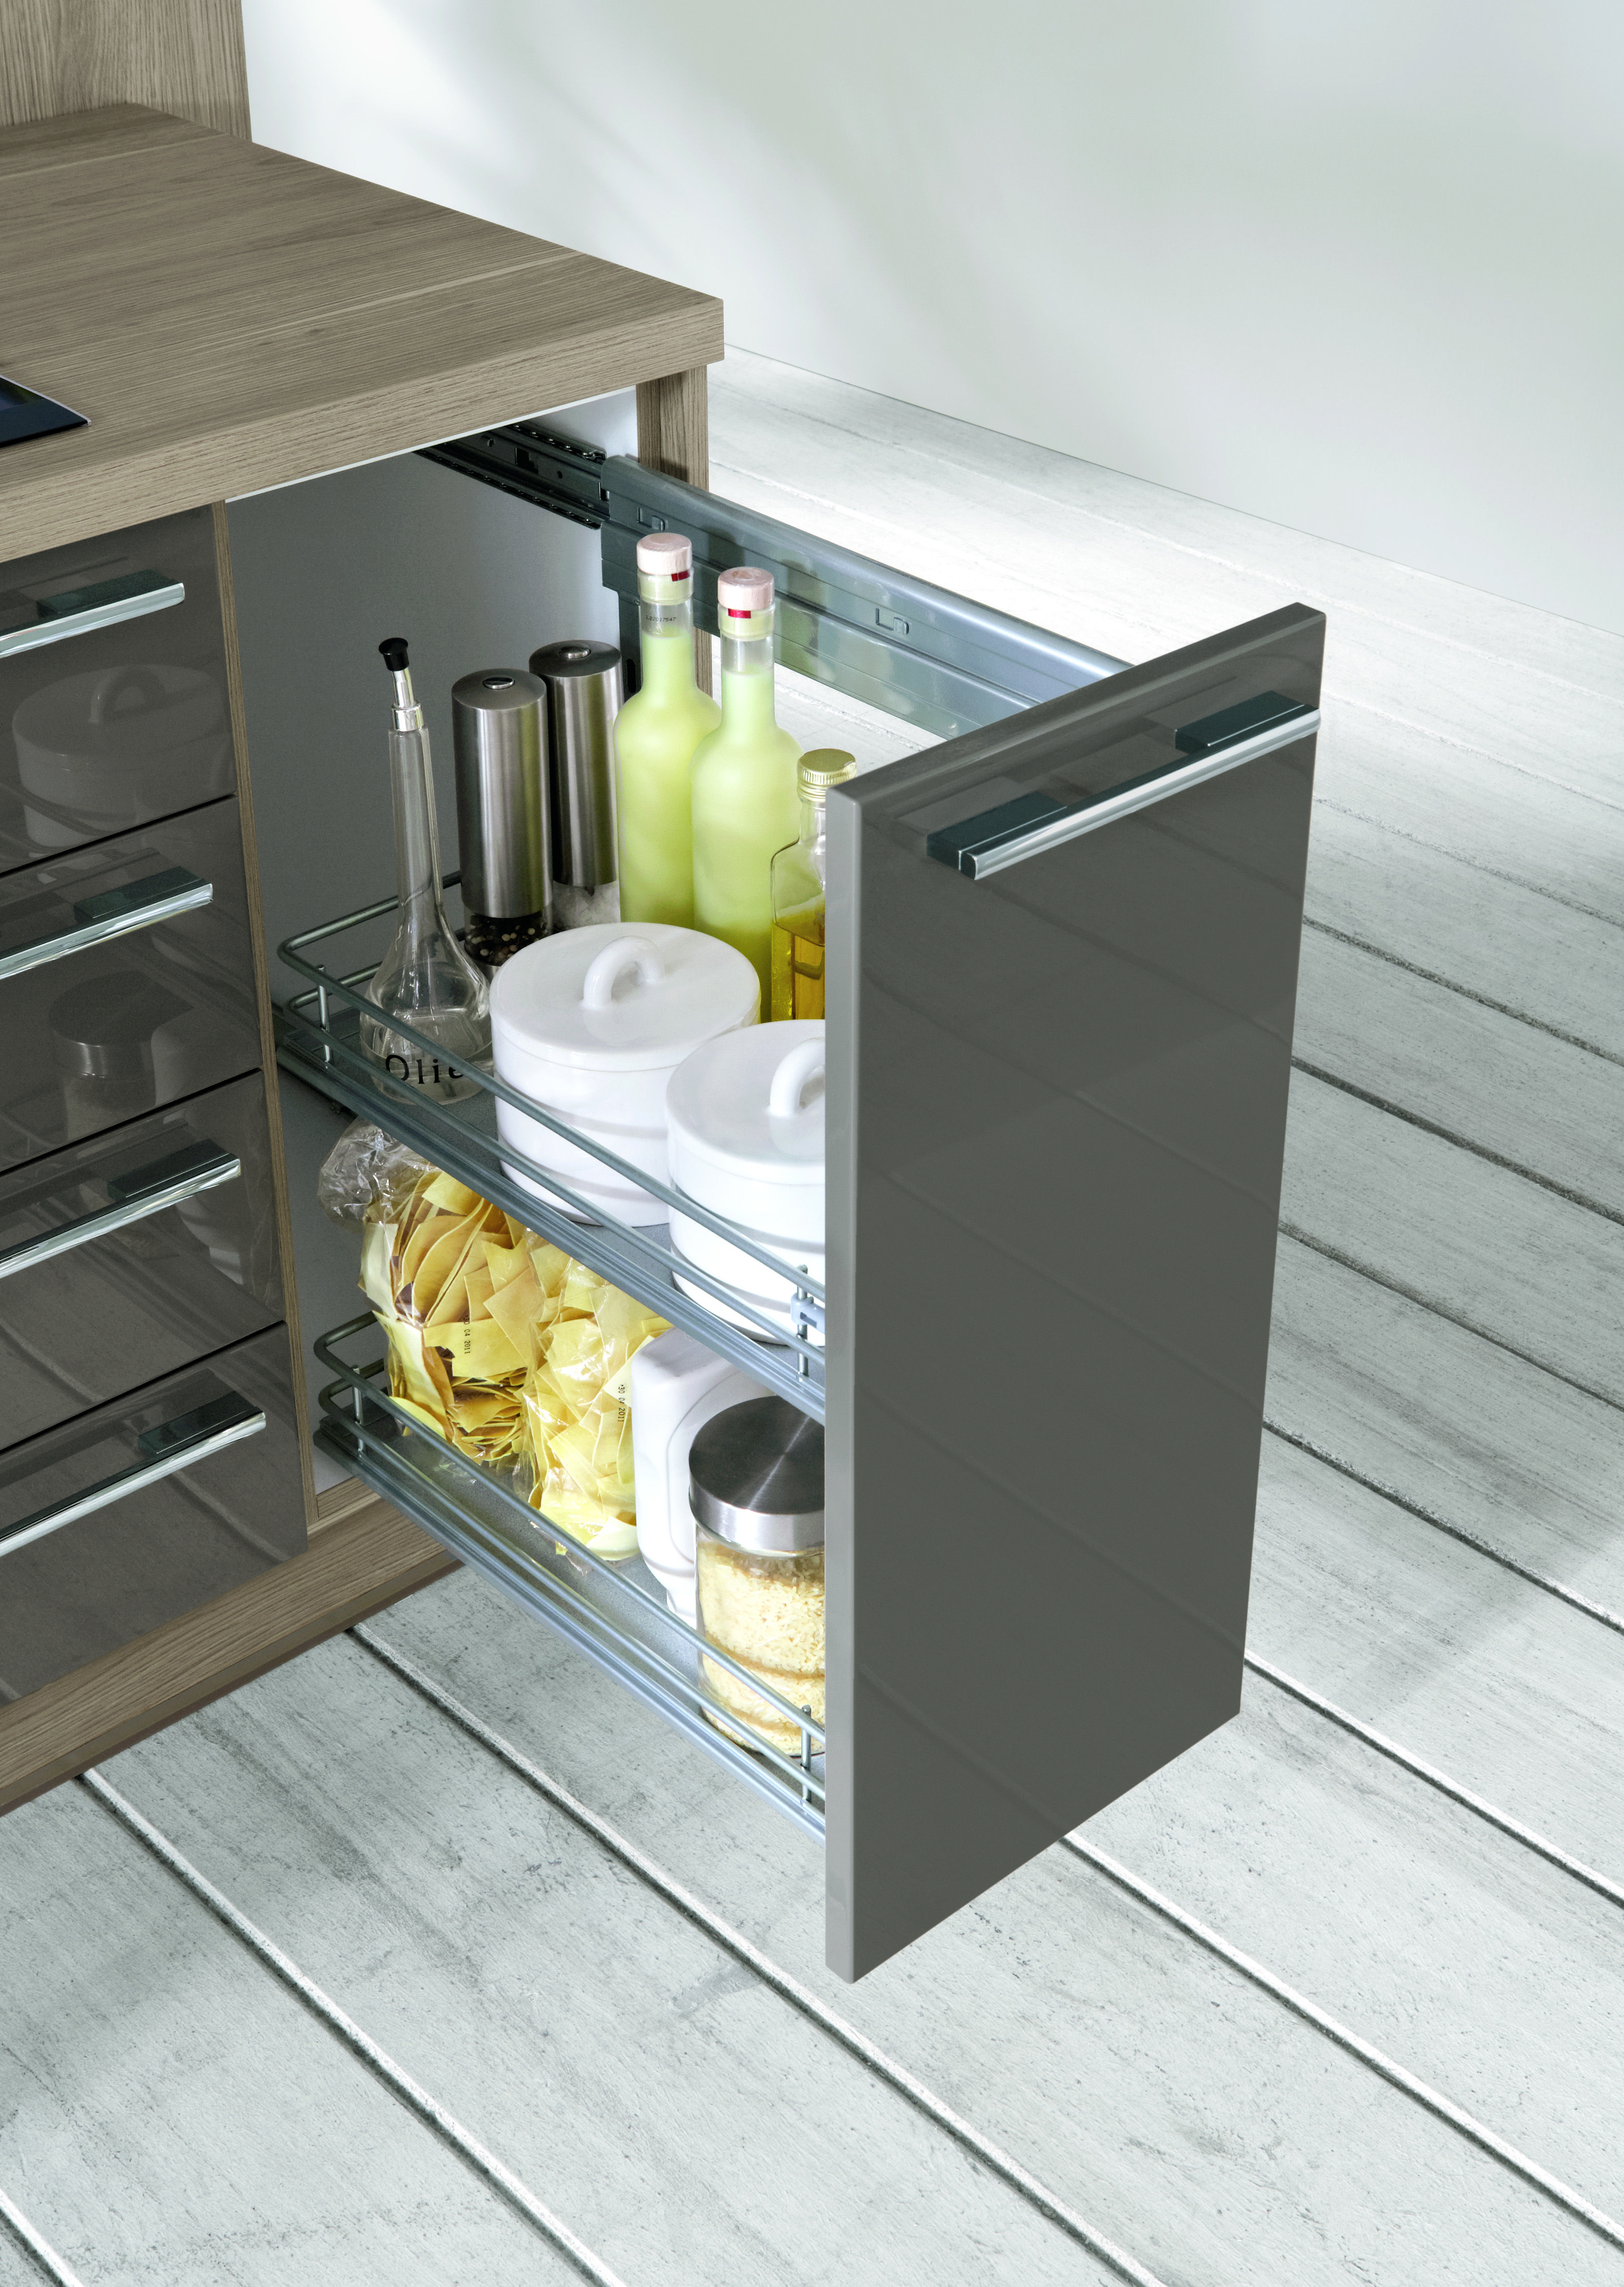 Keuken i kast indeling i keuken interieur idee n for Interieur ideeen keuken